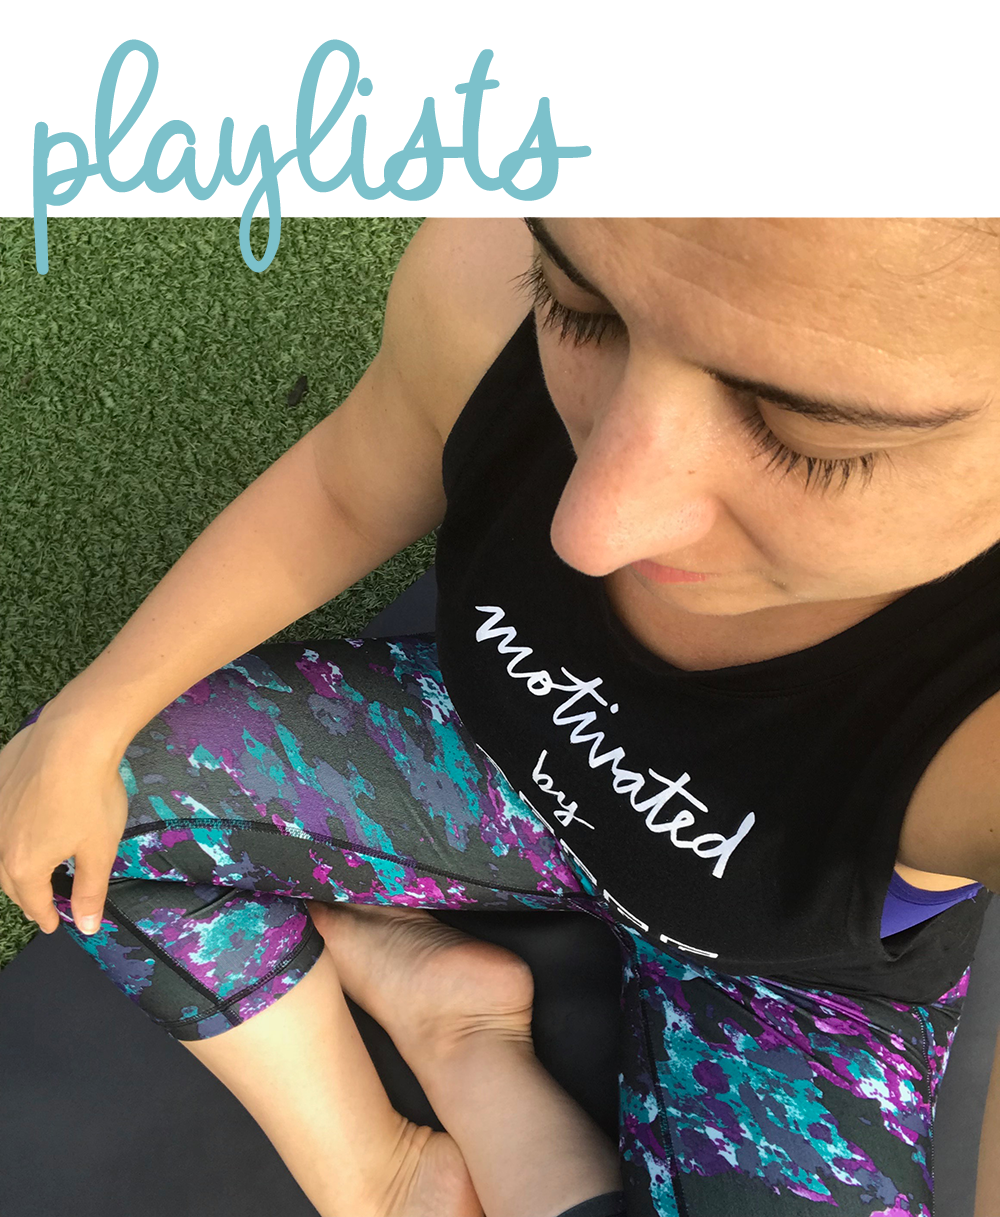 Lisa_Calandriello_Yoga_Teacher_Playlists.png